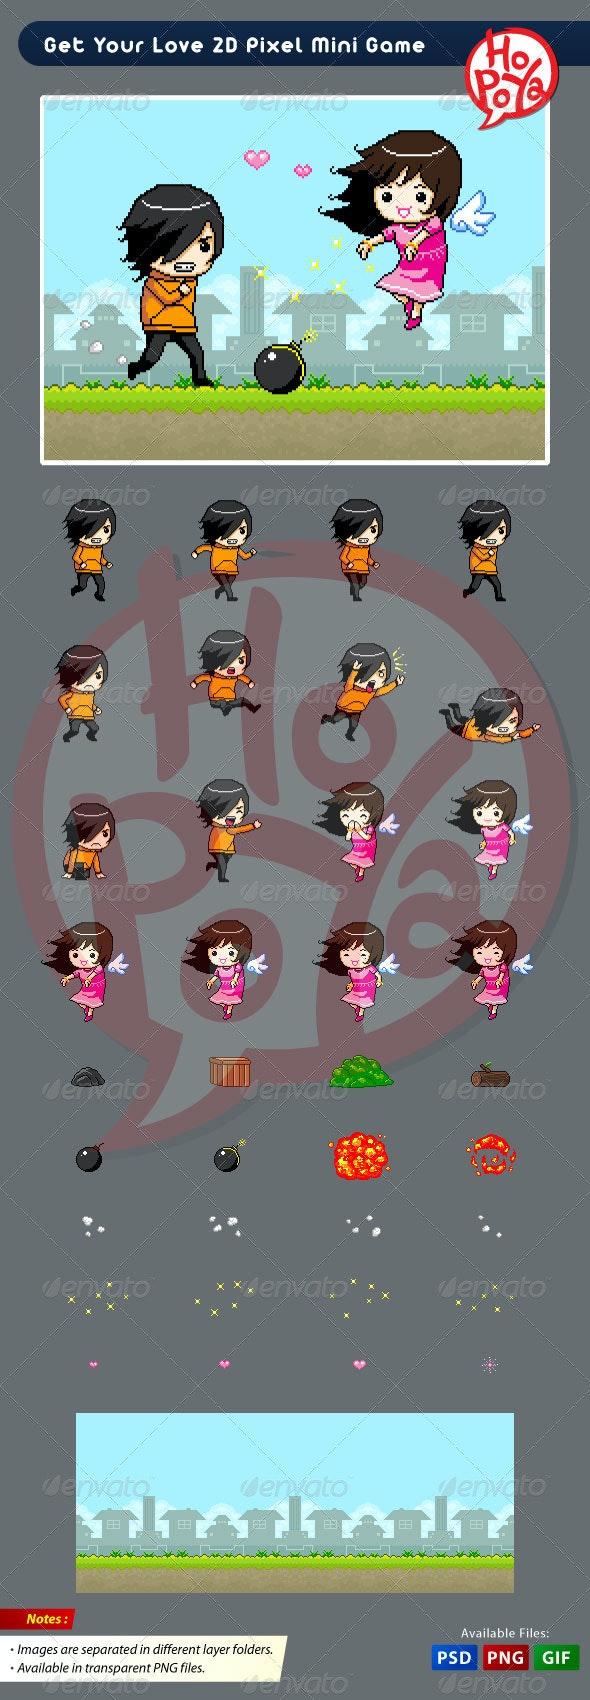 Get Your Love 2D Pixel Mini Game